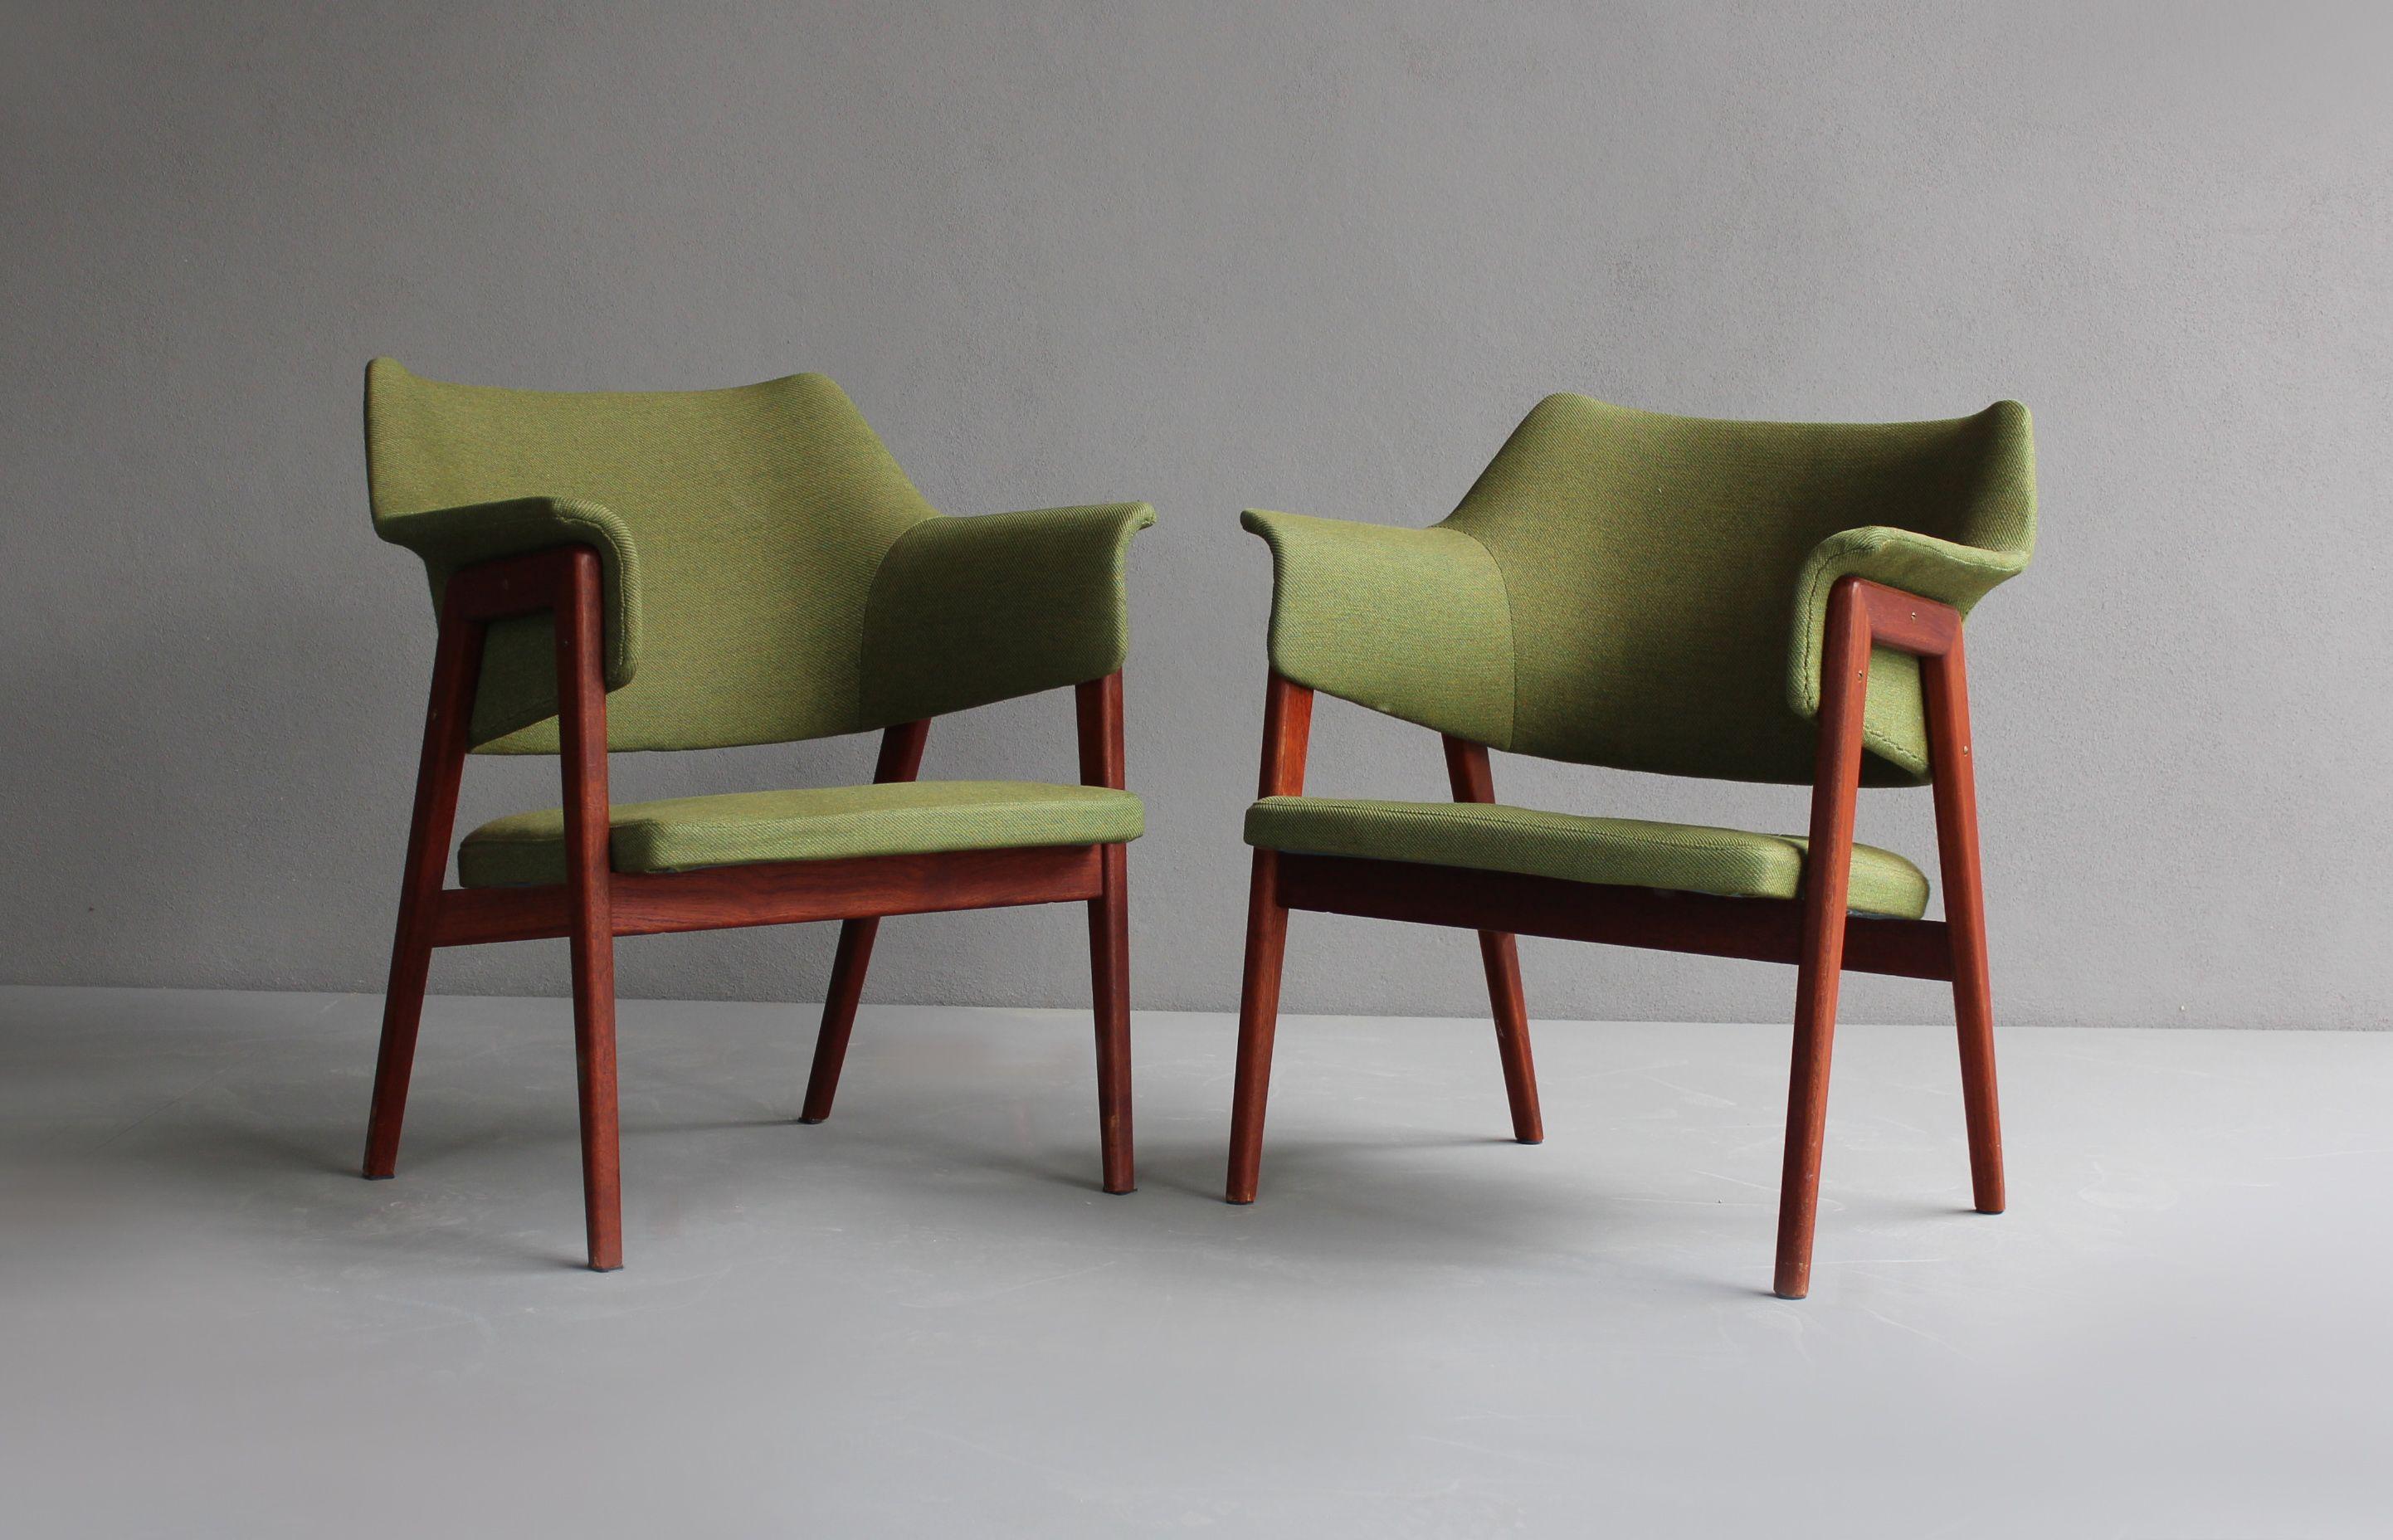 teak armchair by karl erik ekselius for joc 1960. Black Bedroom Furniture Sets. Home Design Ideas